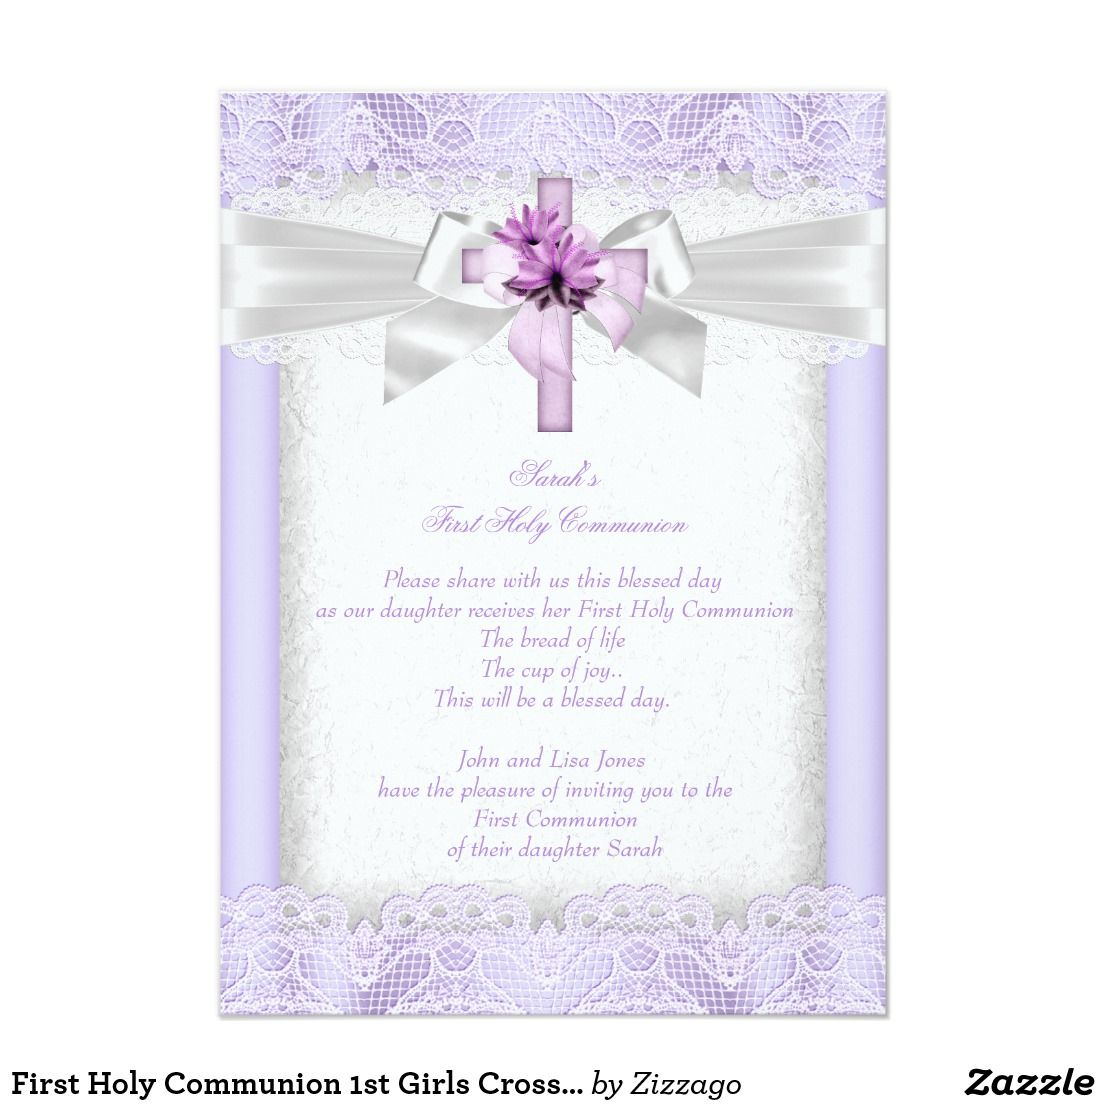 First Holy Communion 1st Girls Cross Lavender Invitation